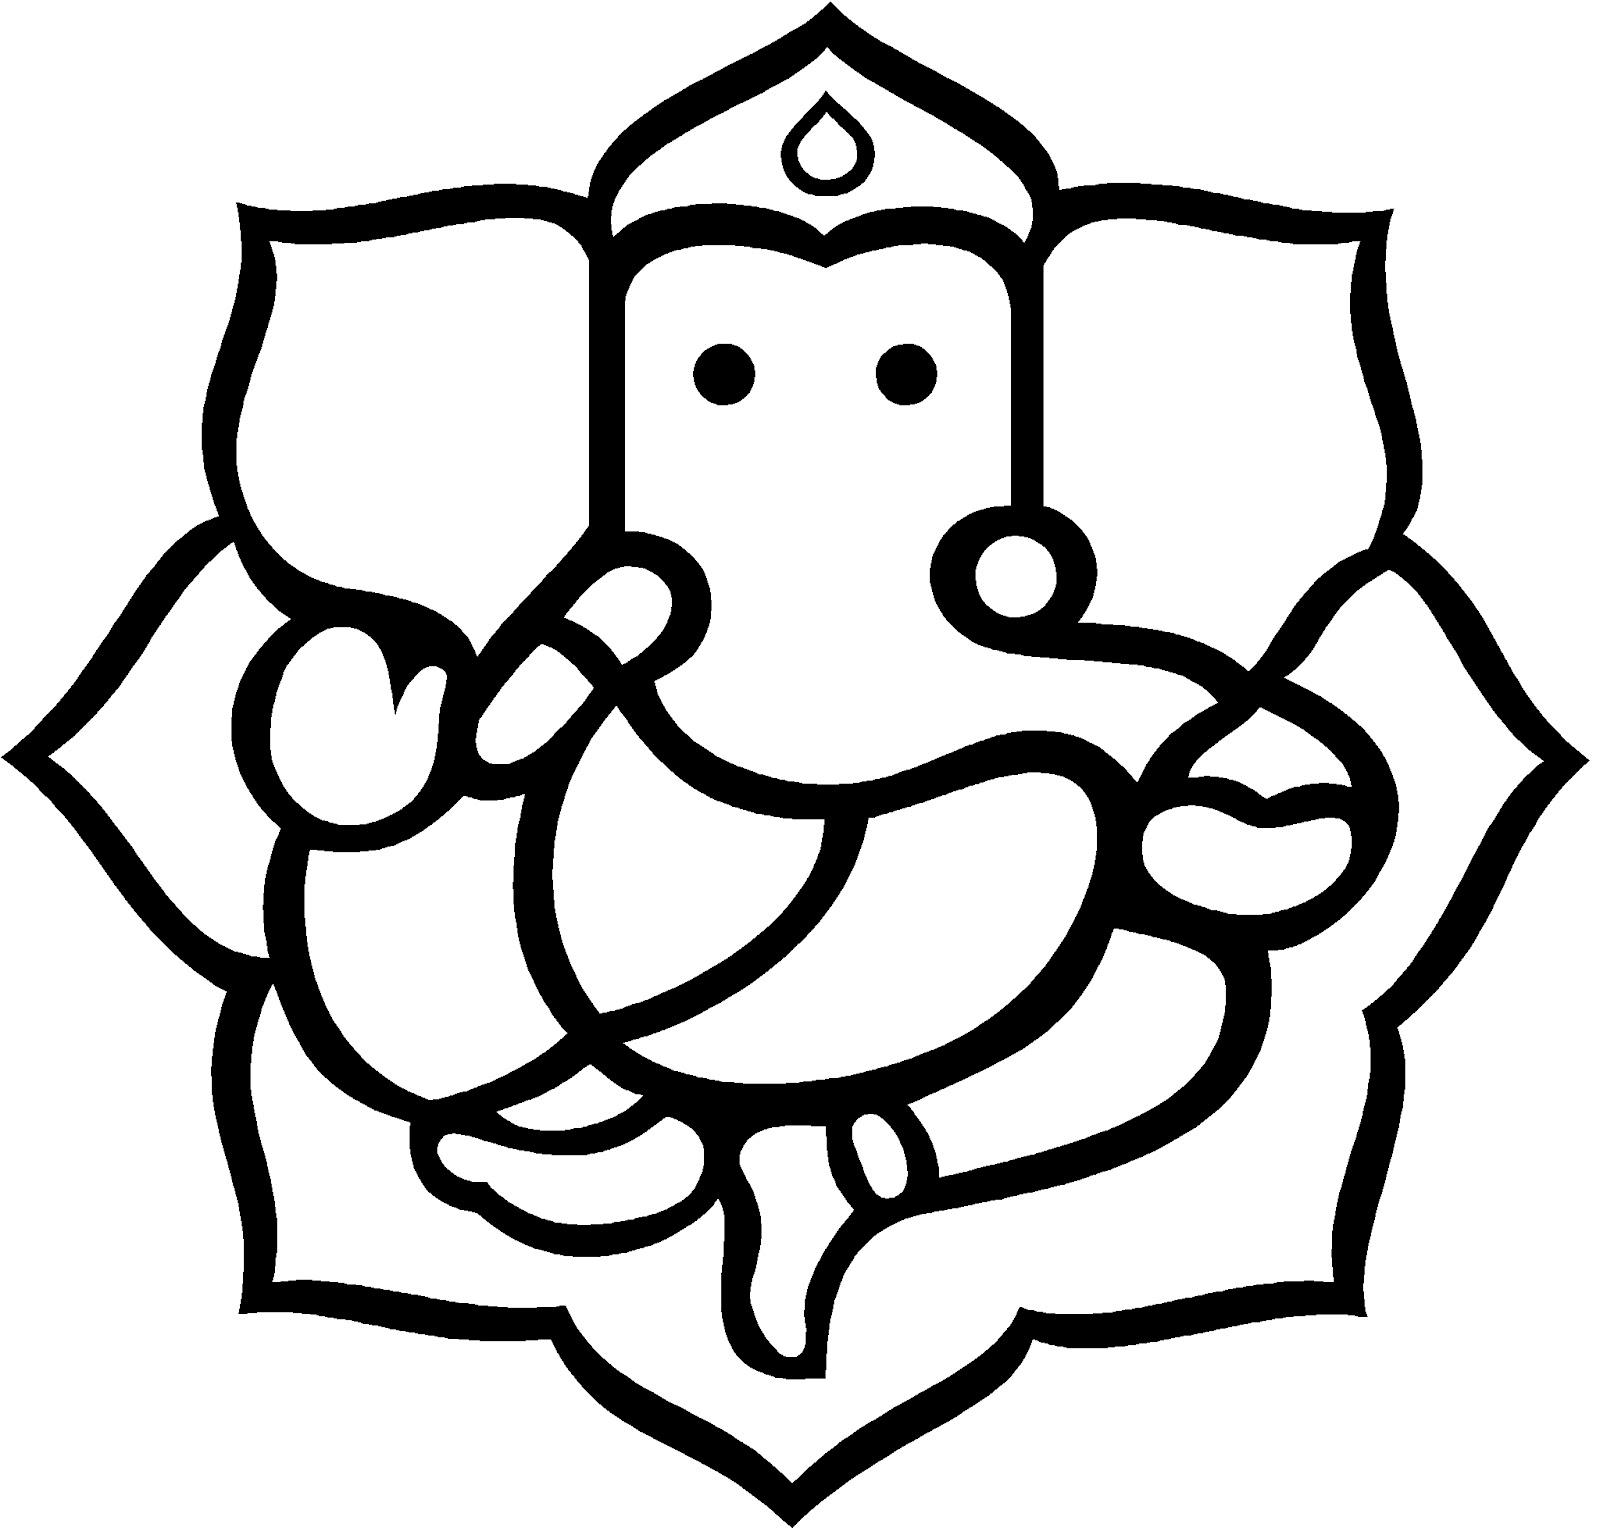 Simple Ganpati Drawings - ClipArt Best